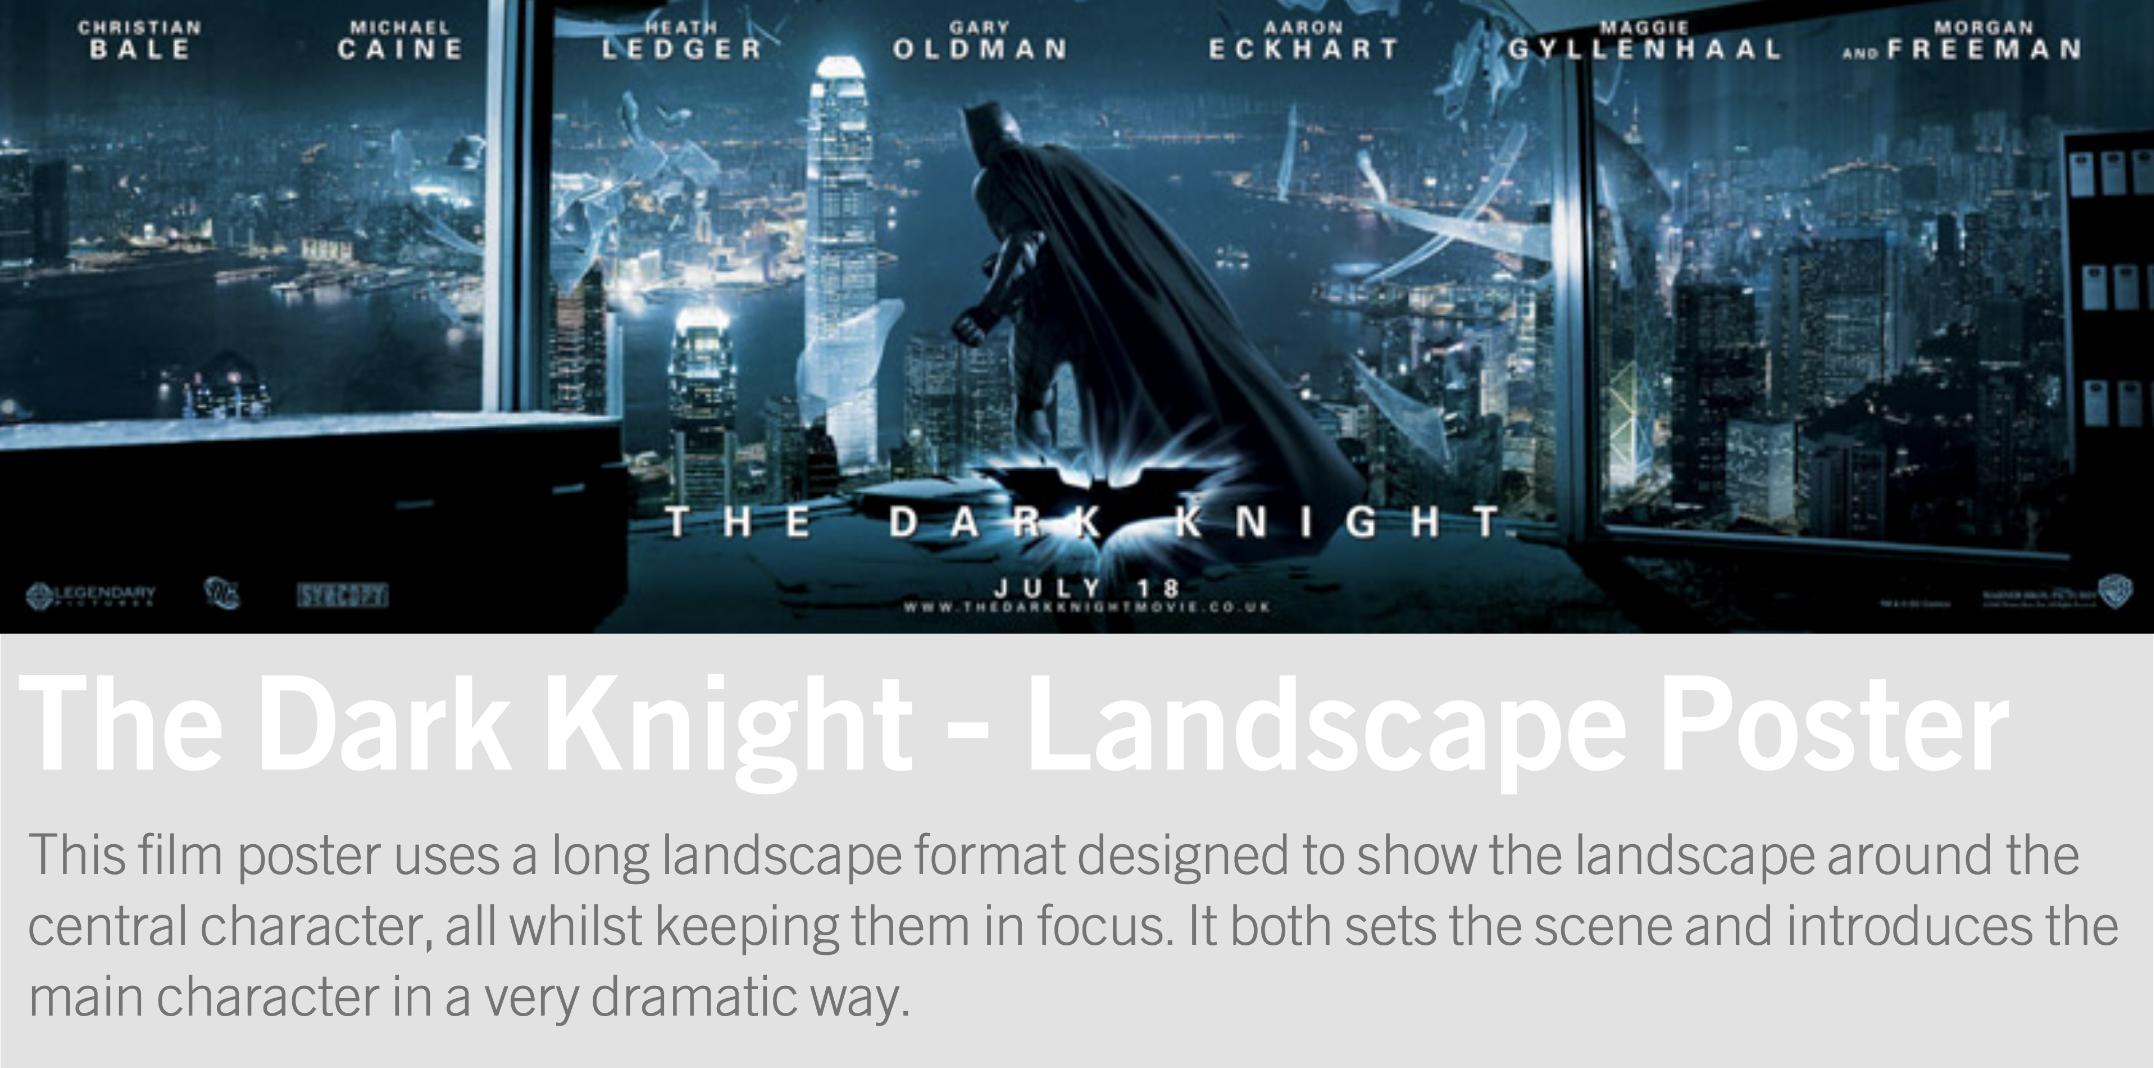 Landscape Poster Analysis Landscape Poster Landscape Movie Posters